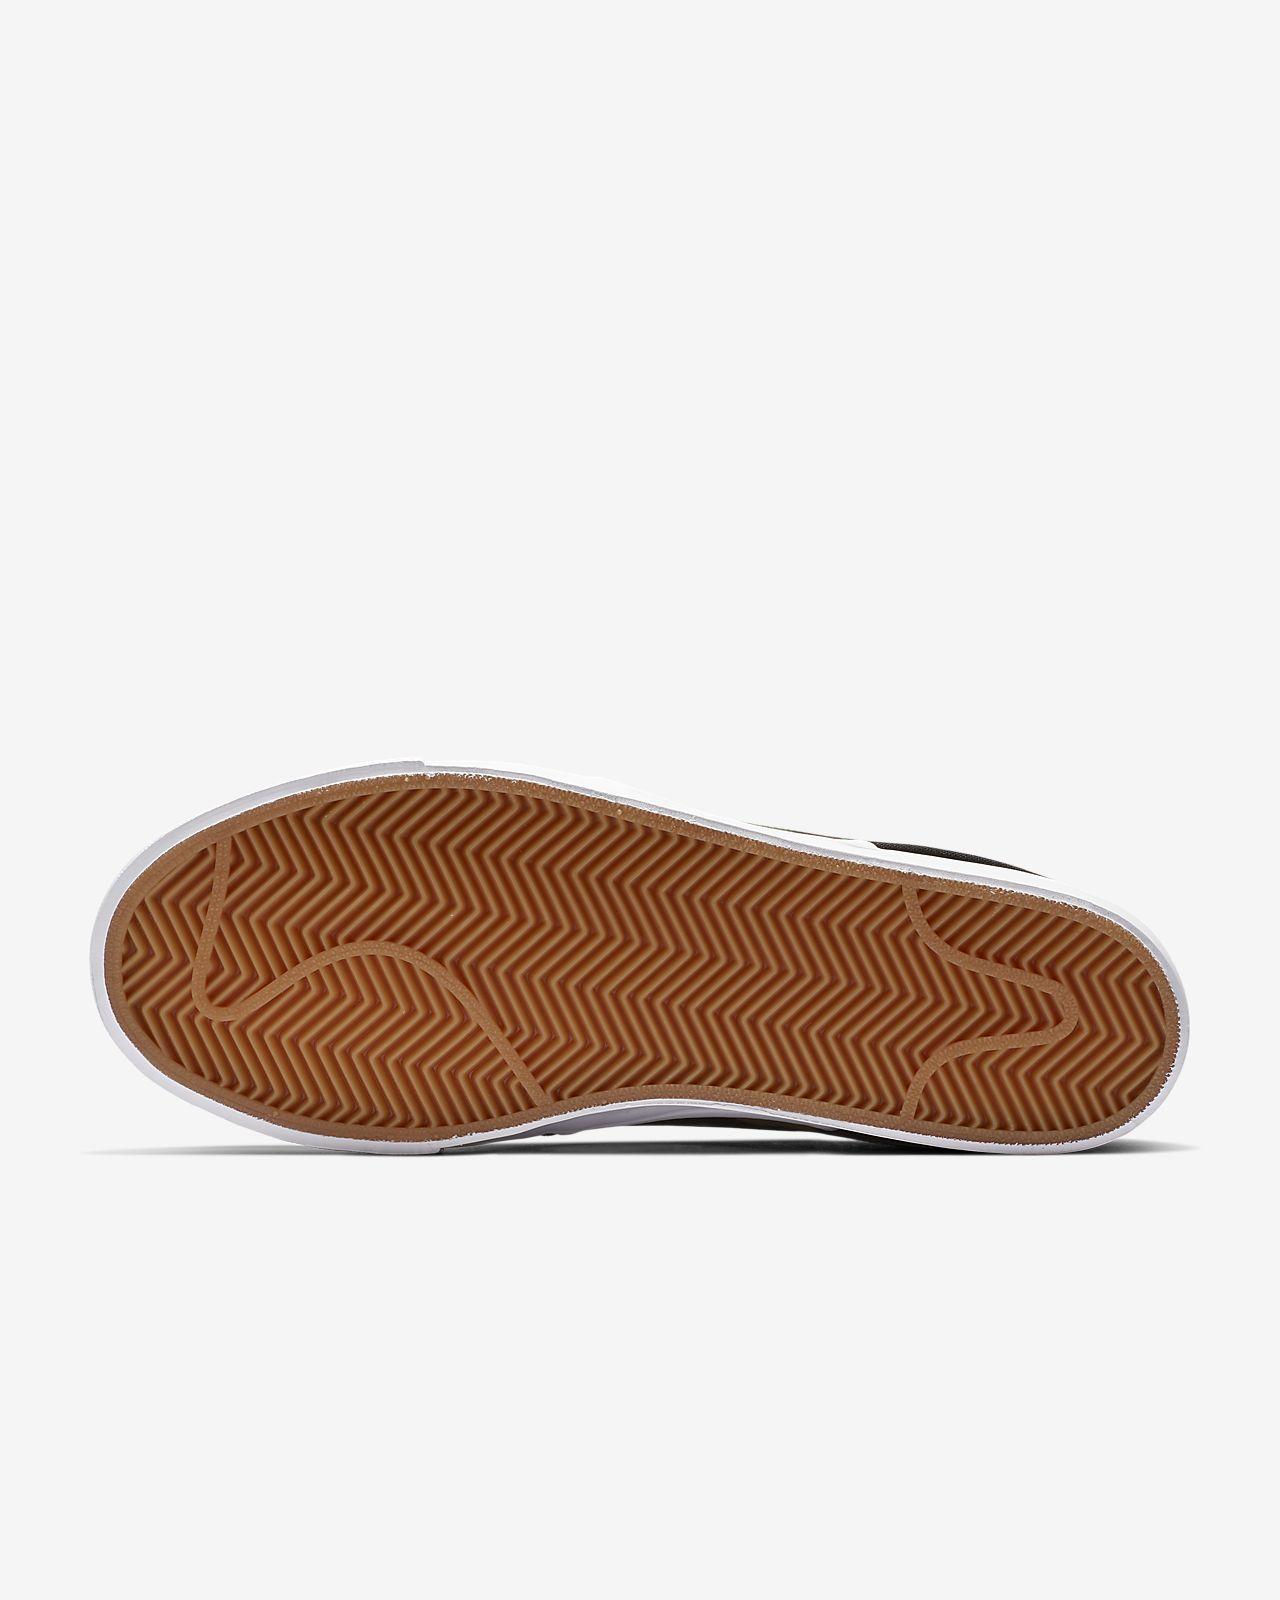 817ce03c10d Skateboardsko Nike SB Zoom Stefan Janoski Canvas för män. Nike.com SE